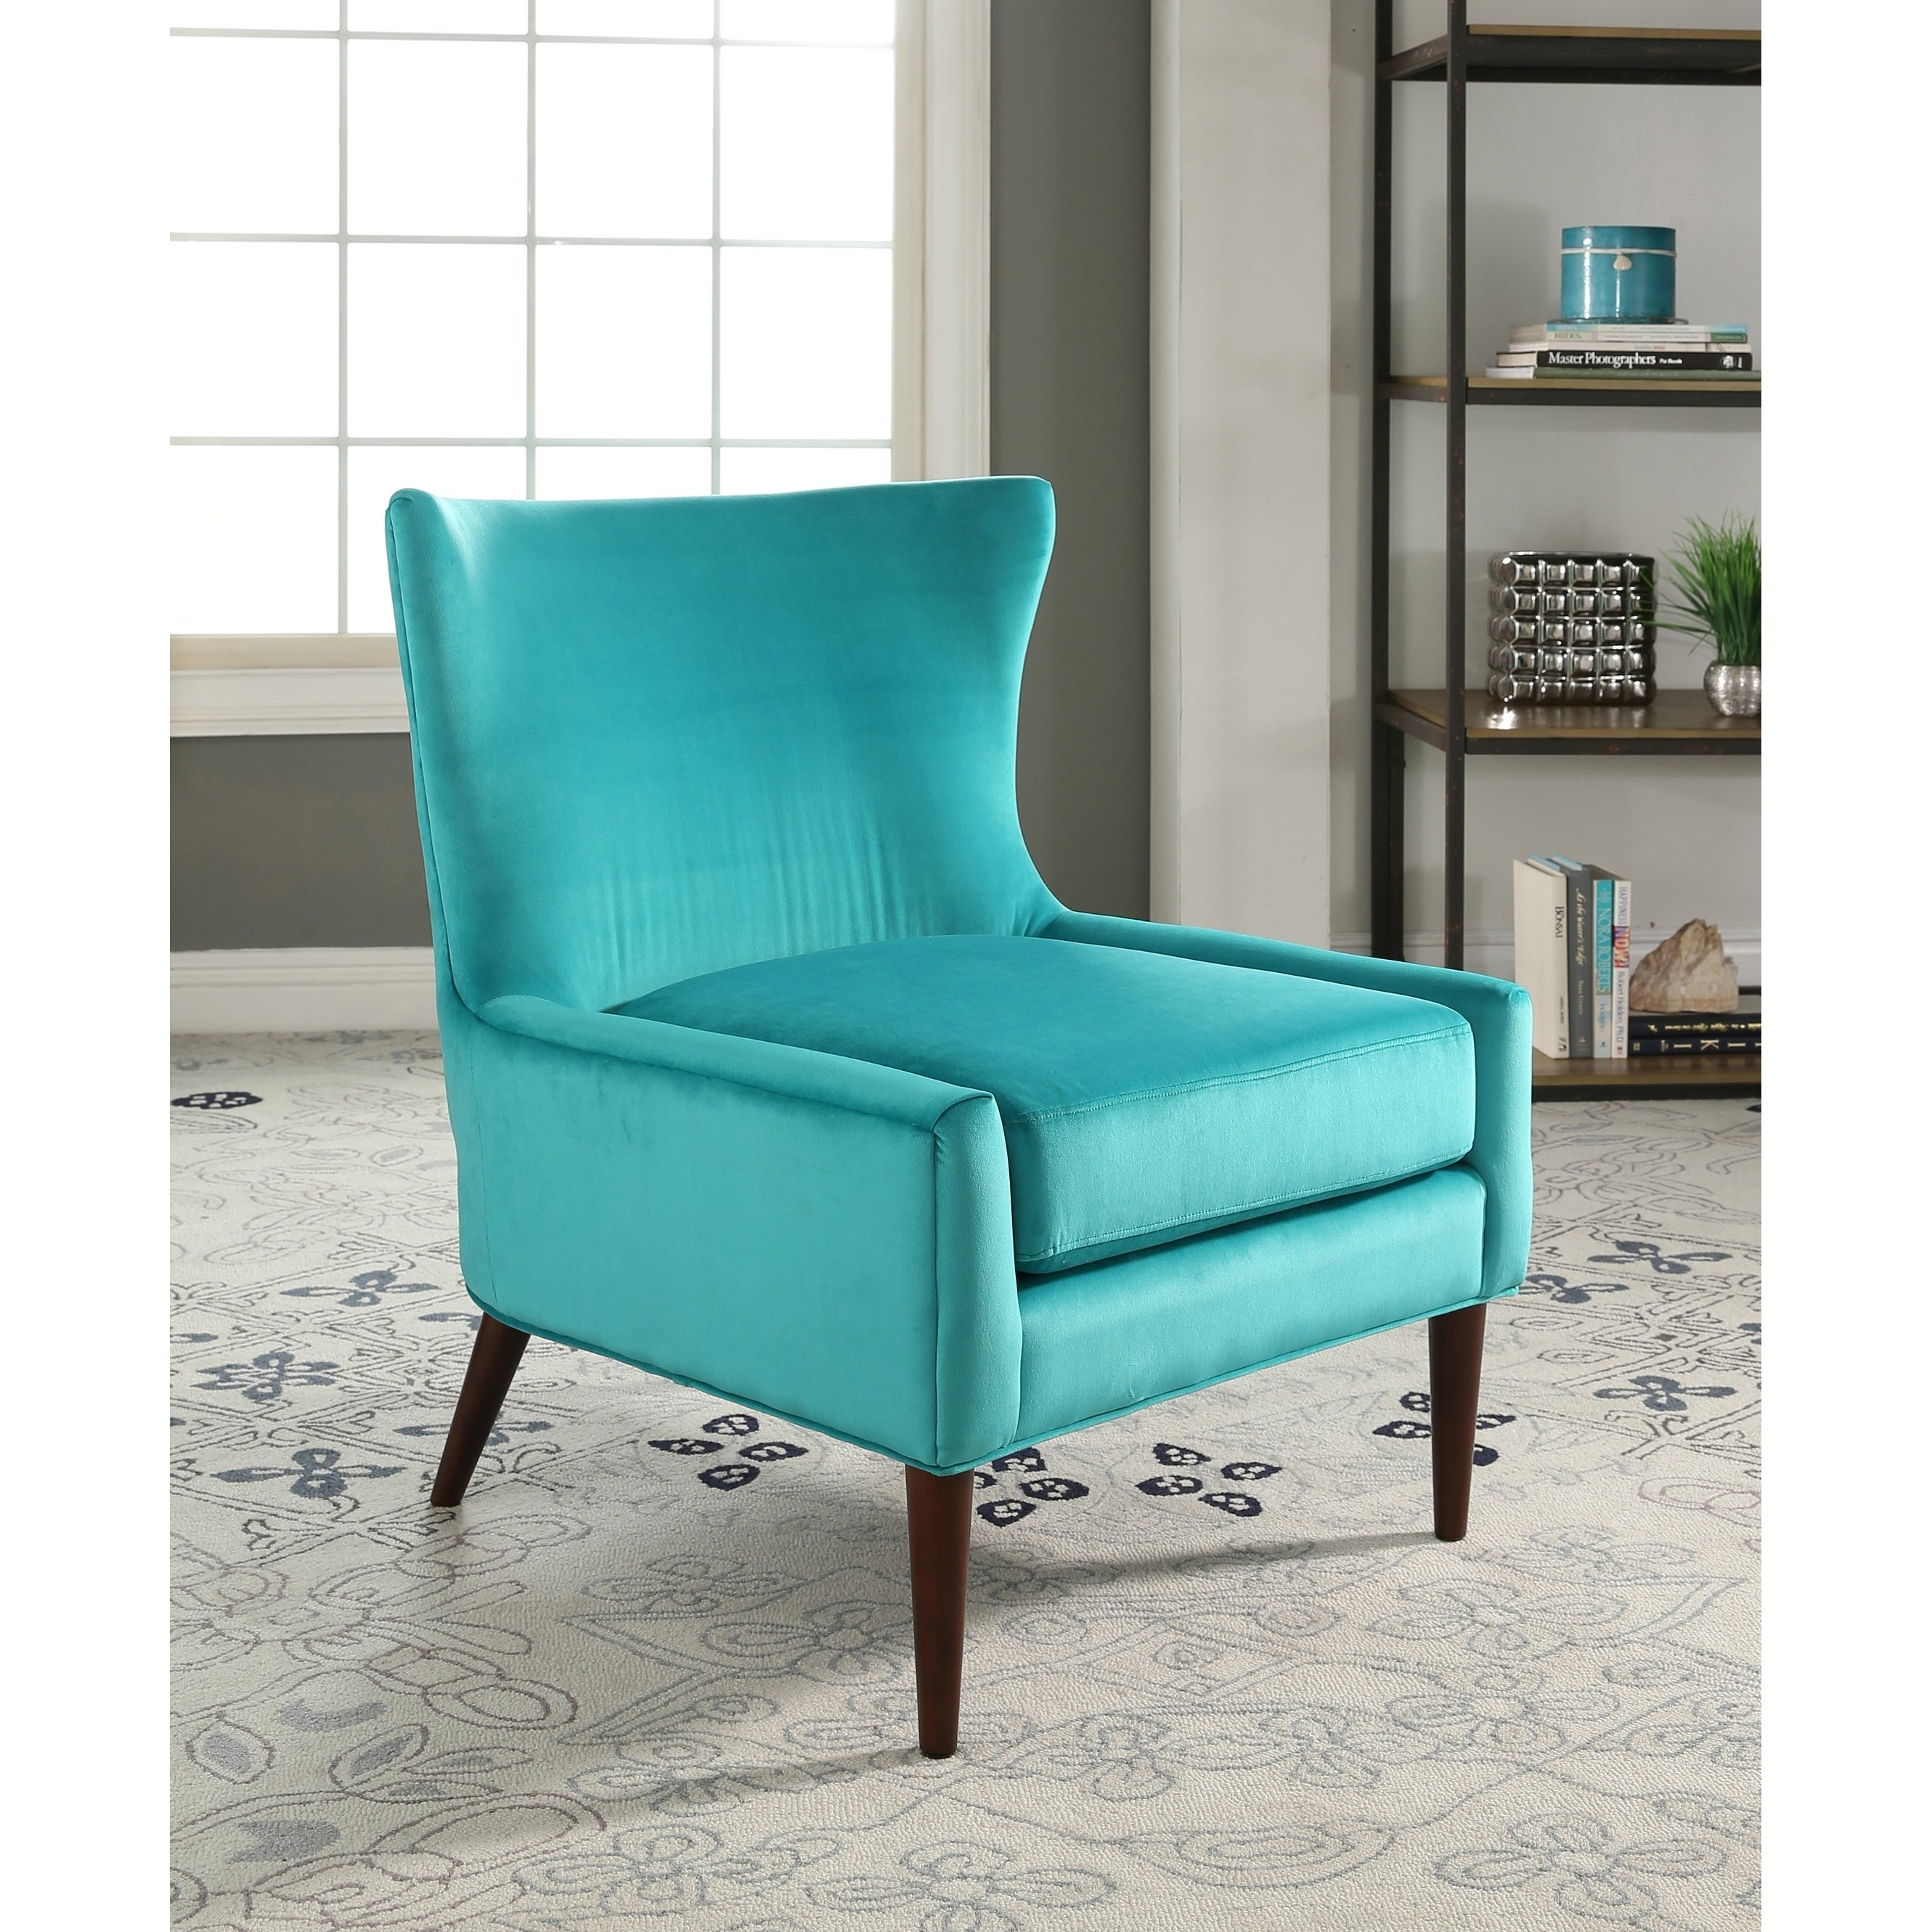 Shop Abbyson Auburn Velvet Wingback Chair   On Sale   Free Shipping Today    Overstock.com   17627563